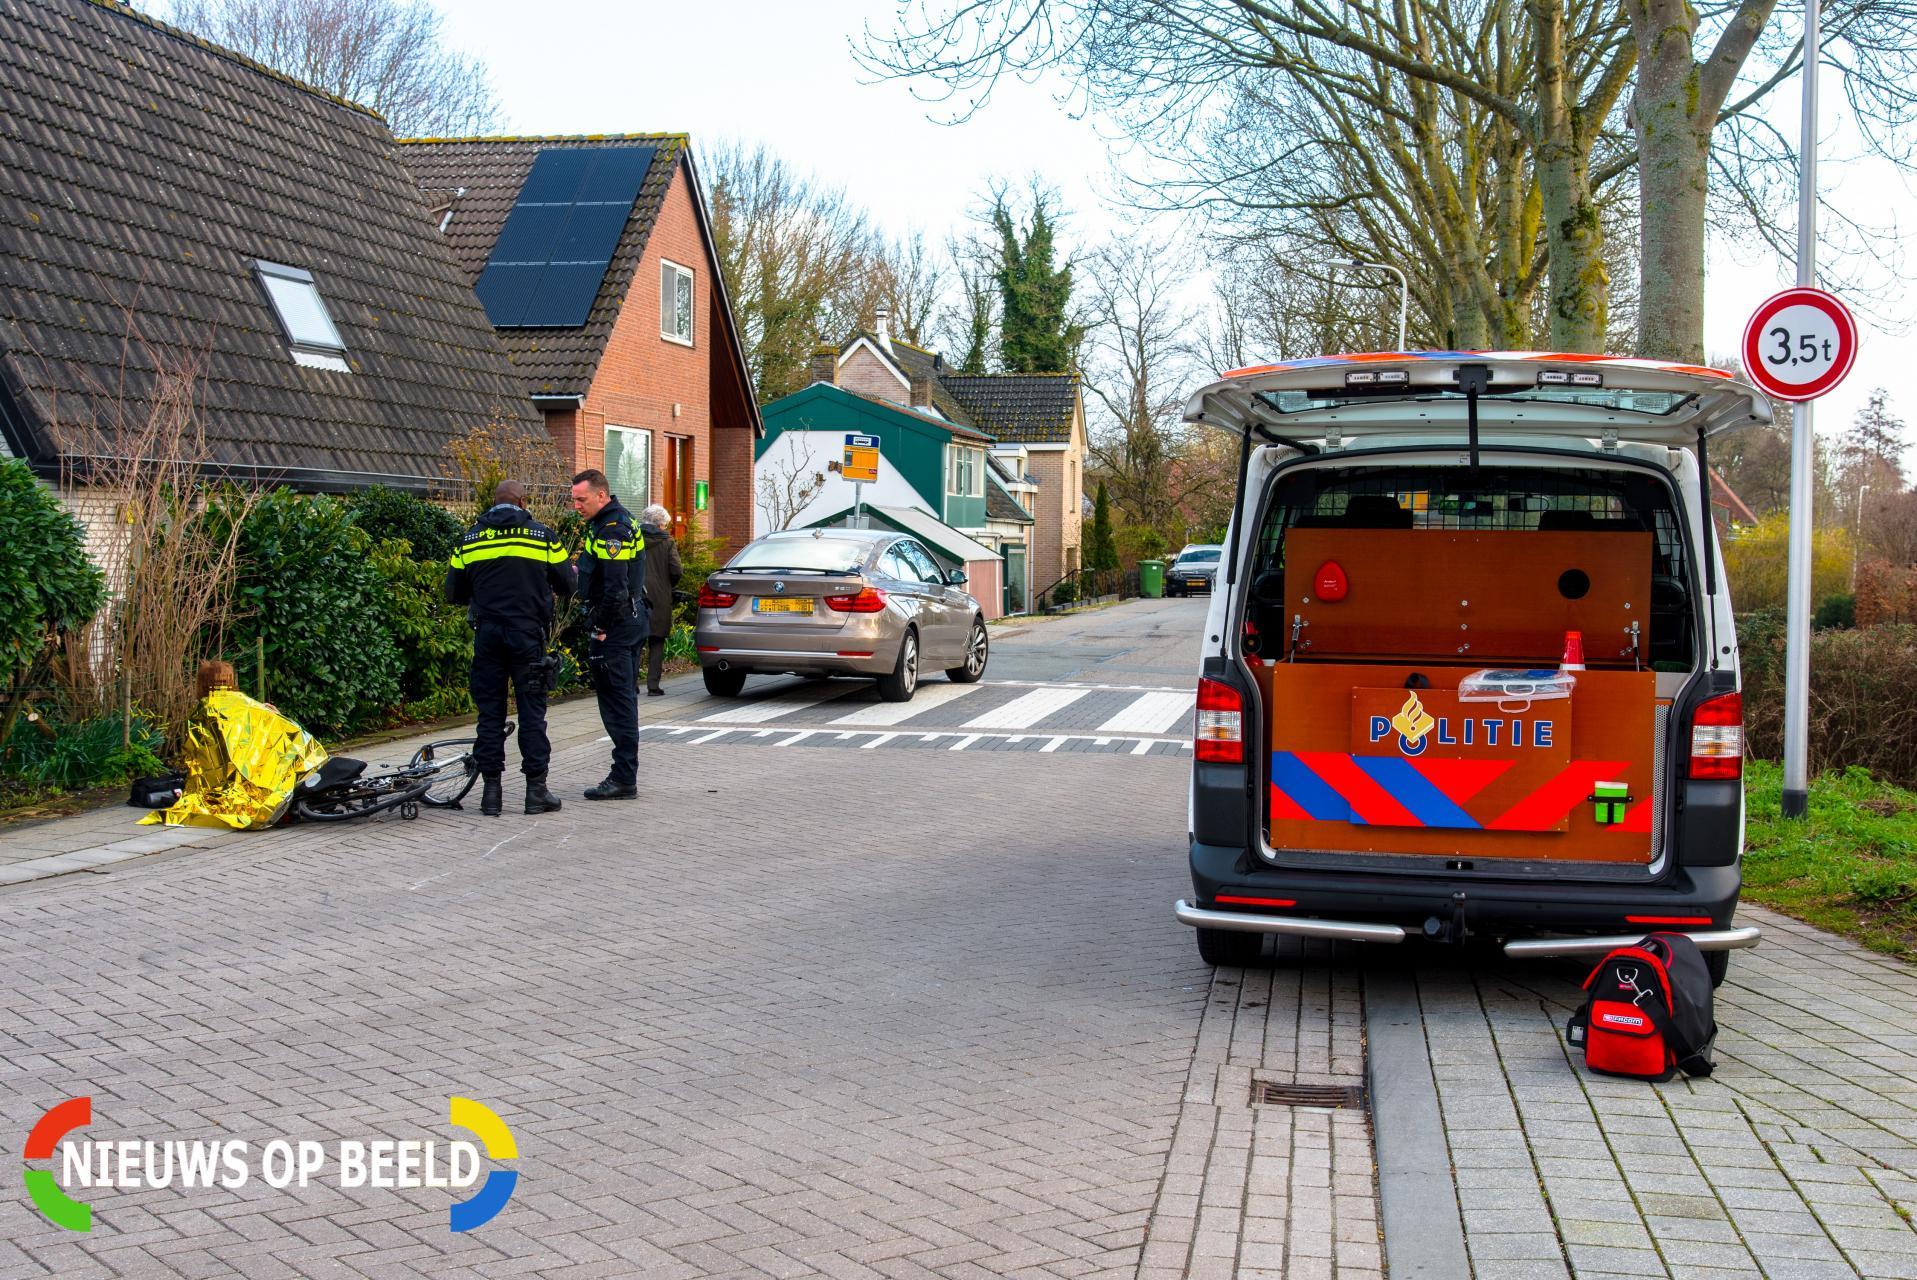 Fietsster gewond na botsing met auto Tijsjesdijk Rhoon